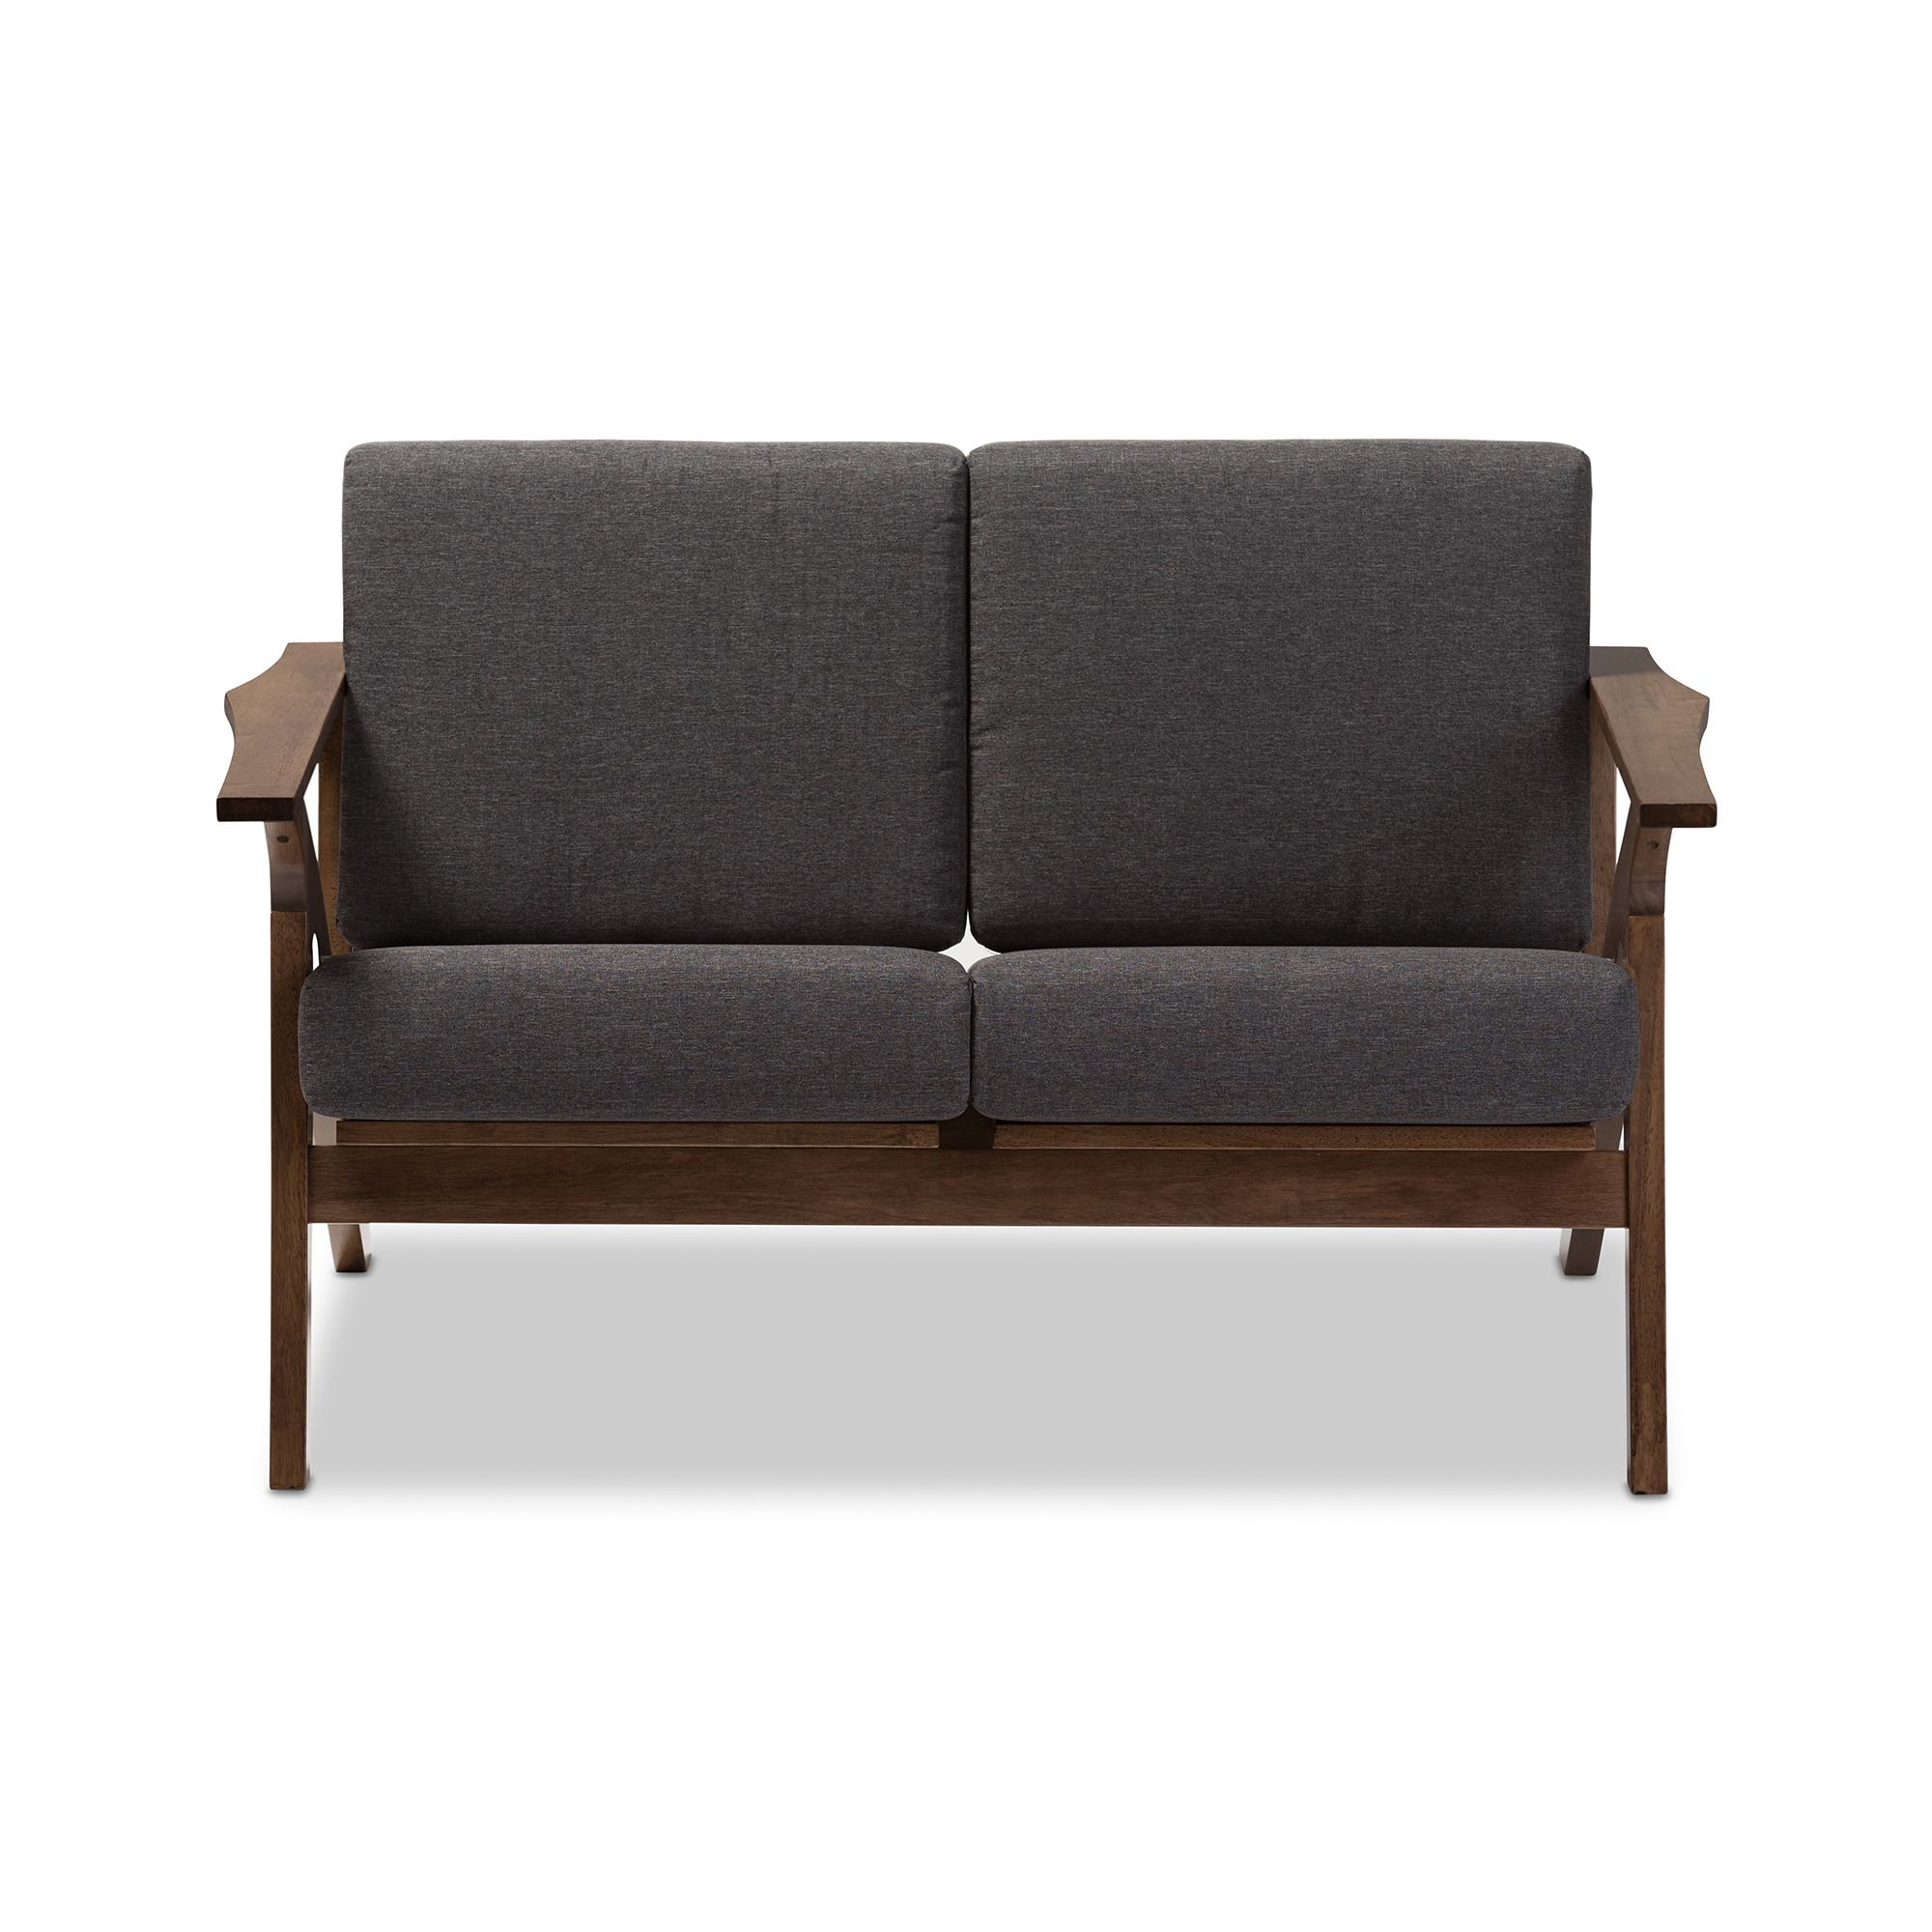 sofa set brown loveseat new soflex fabric wood hm ebay itm couch chenille trim room living renata